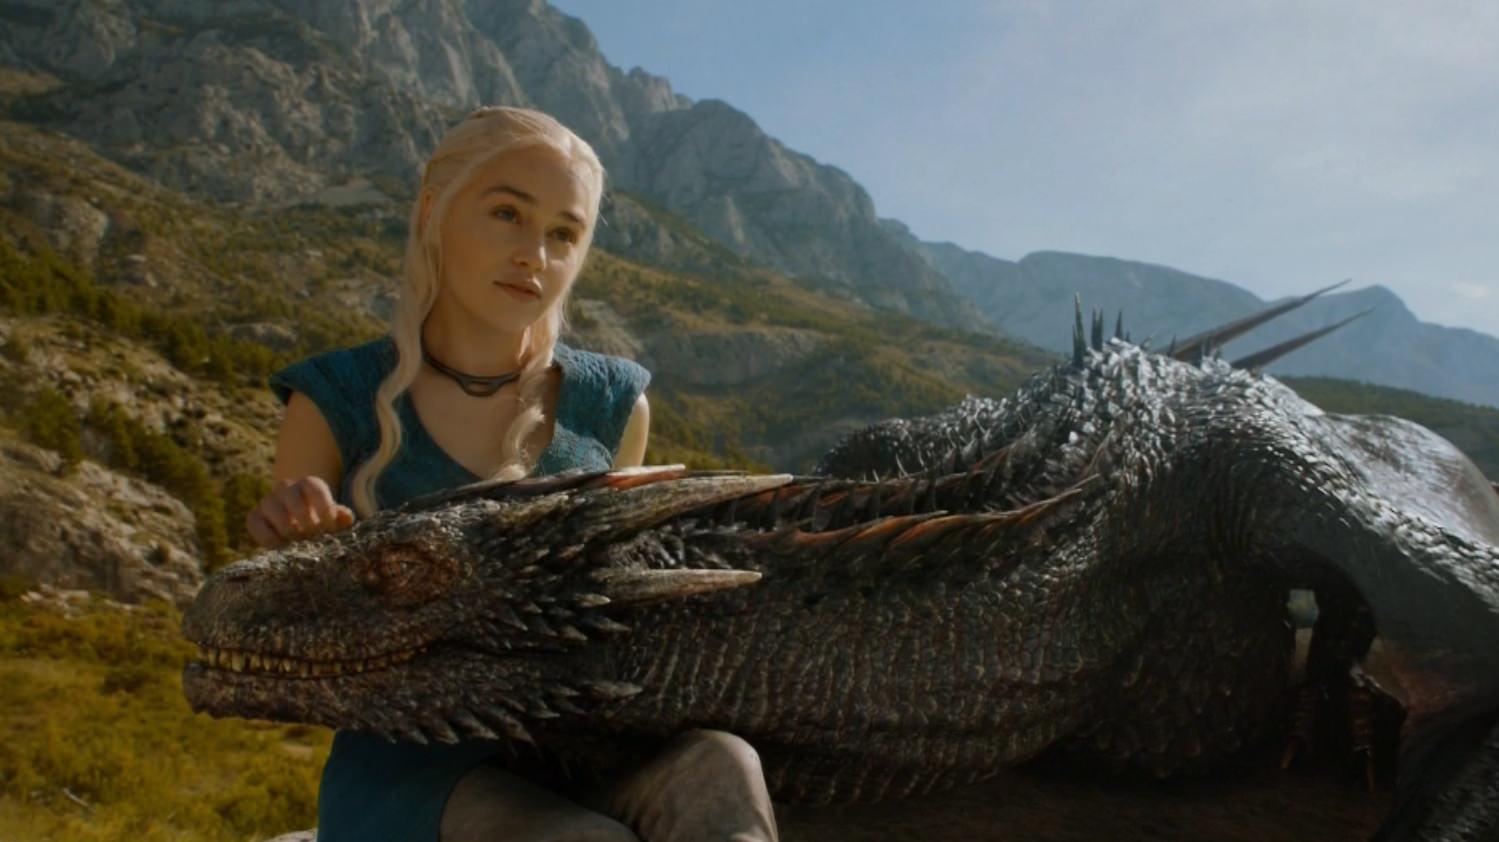 Why Daenerys Targaryen Deserved Better in Game of Thrones Finale